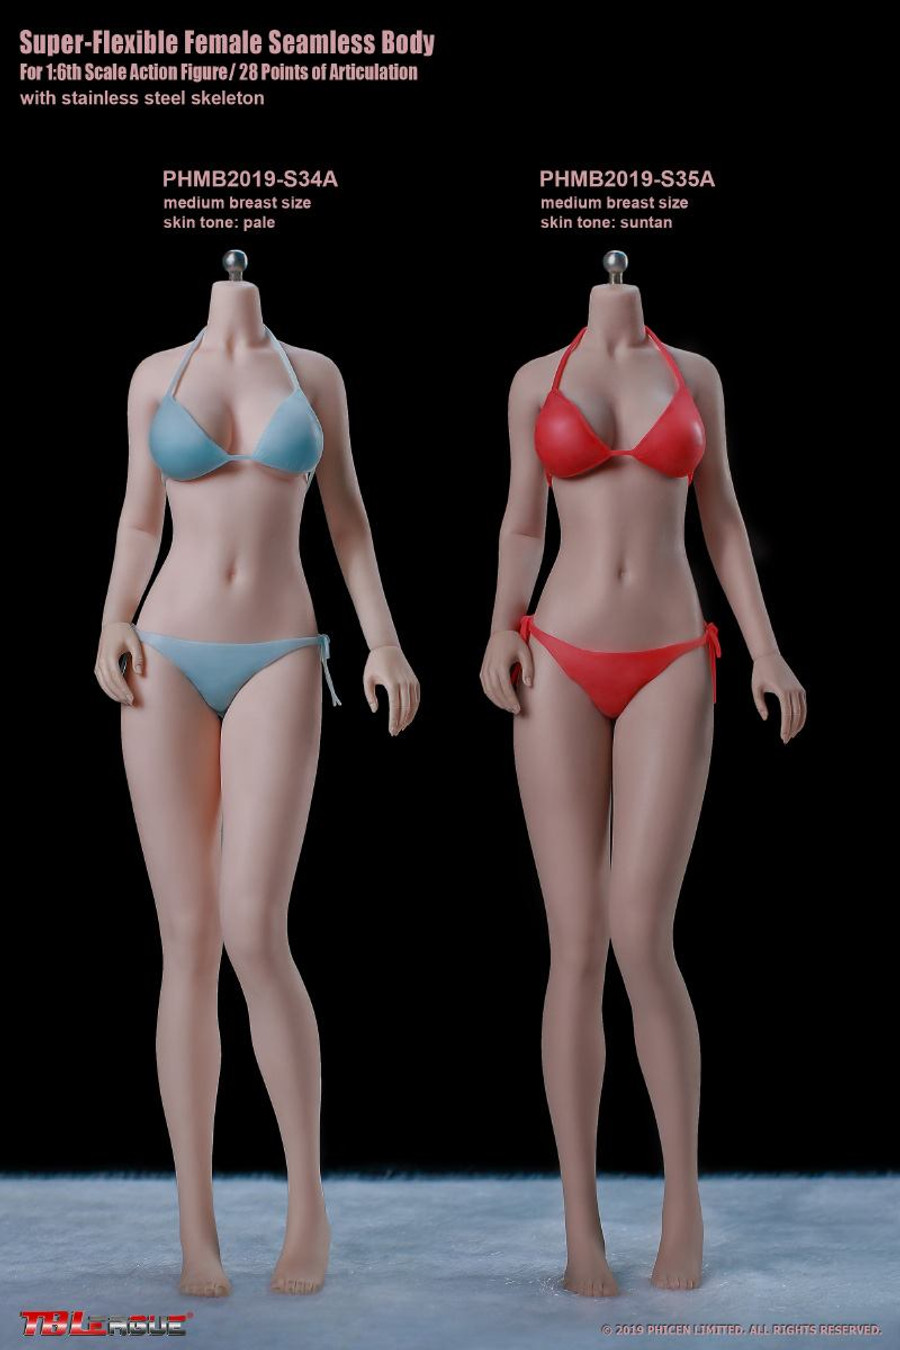 TBLeague - Girl Super-Flexible Seamless Body - S34A Pale Medium